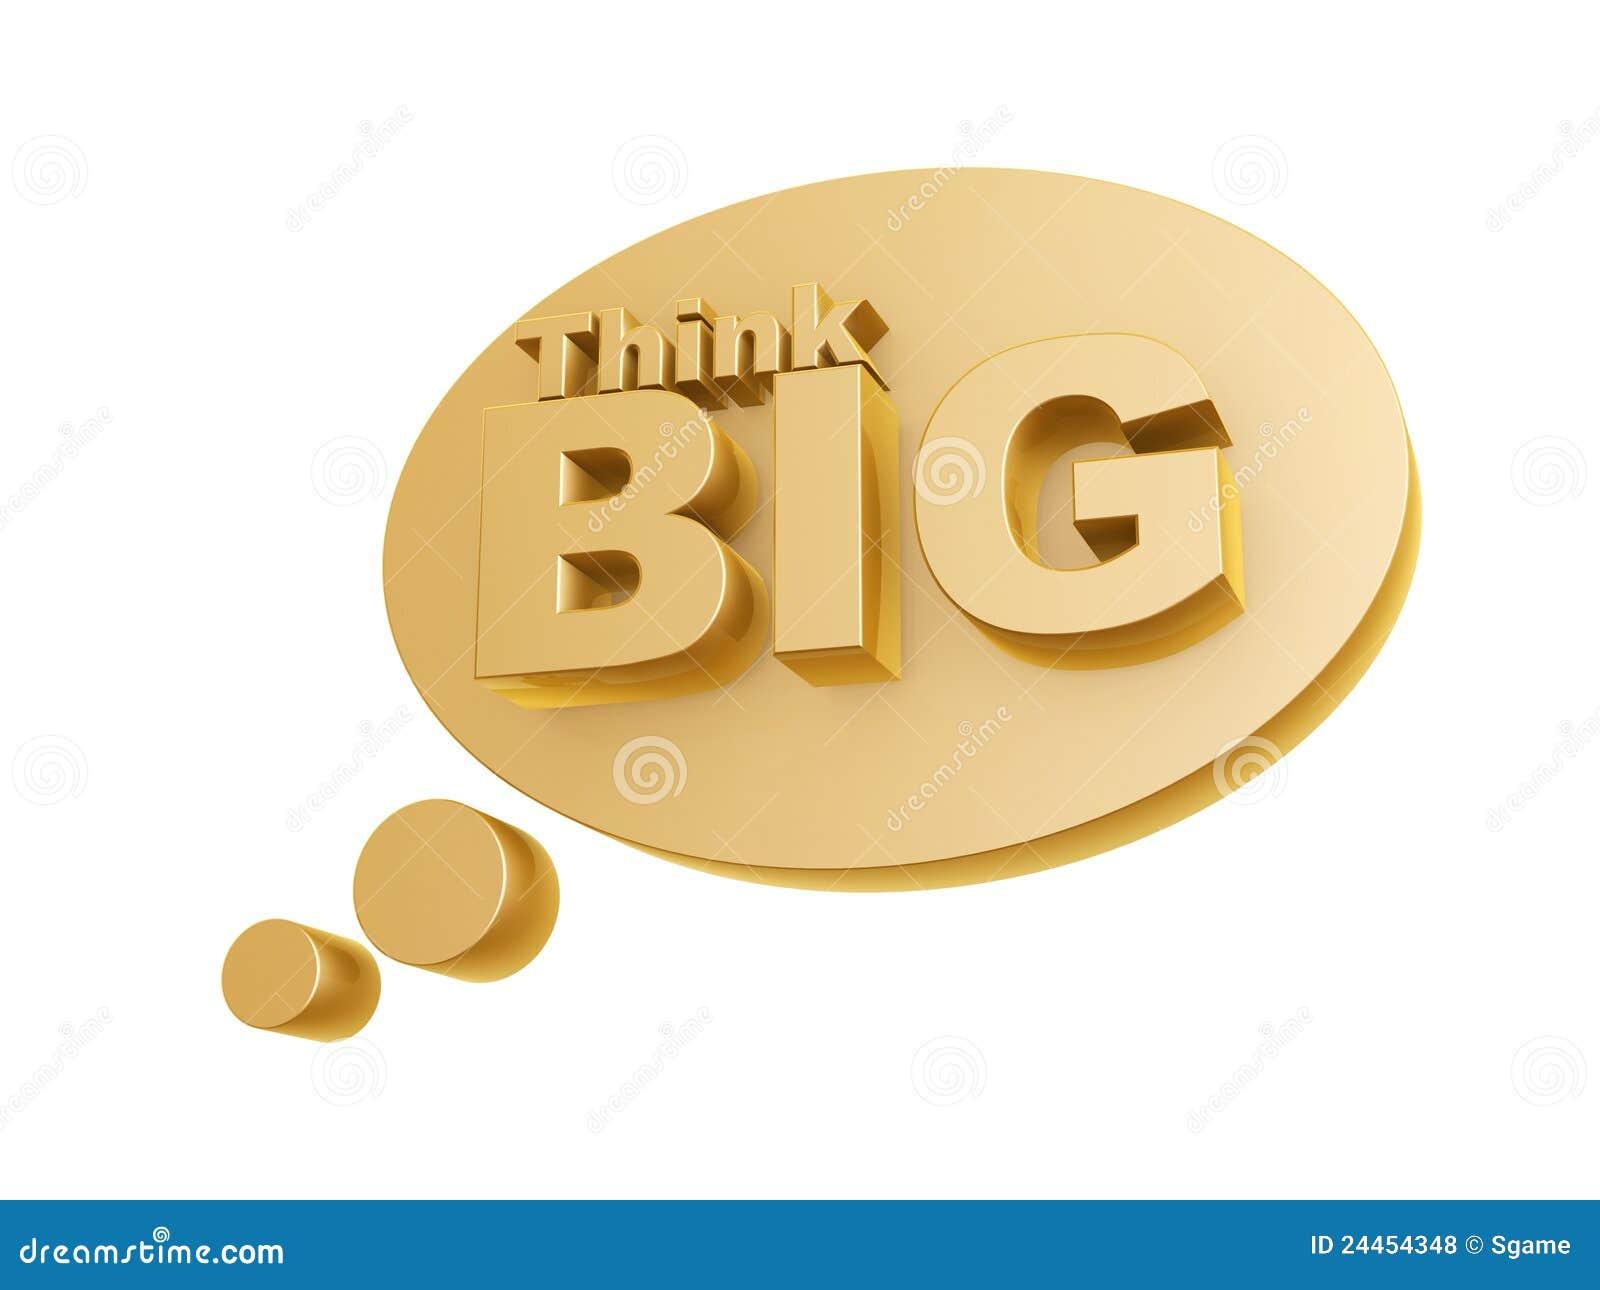 Bubble And Think Big Symbol Stock Illustration - Illustration of ...